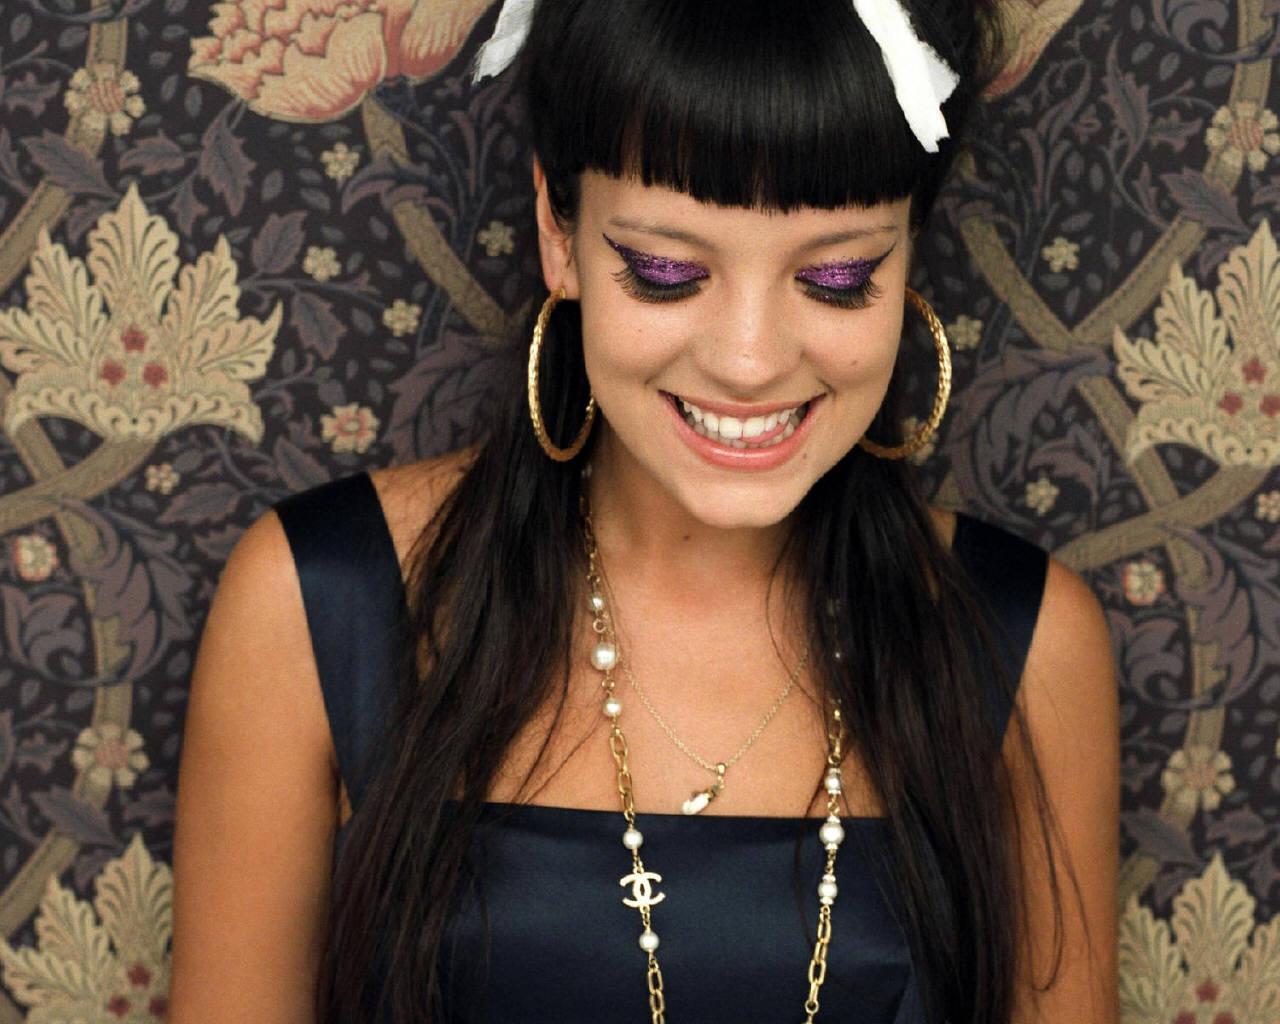 http://1.bp.blogspot.com/-UCywcTMpNrI/TsuAbgXgF-I/AAAAAAAAG1k/Wayt0z-h2AE/s1600/lily_allen+hairstyles+%25282%2529.jpg